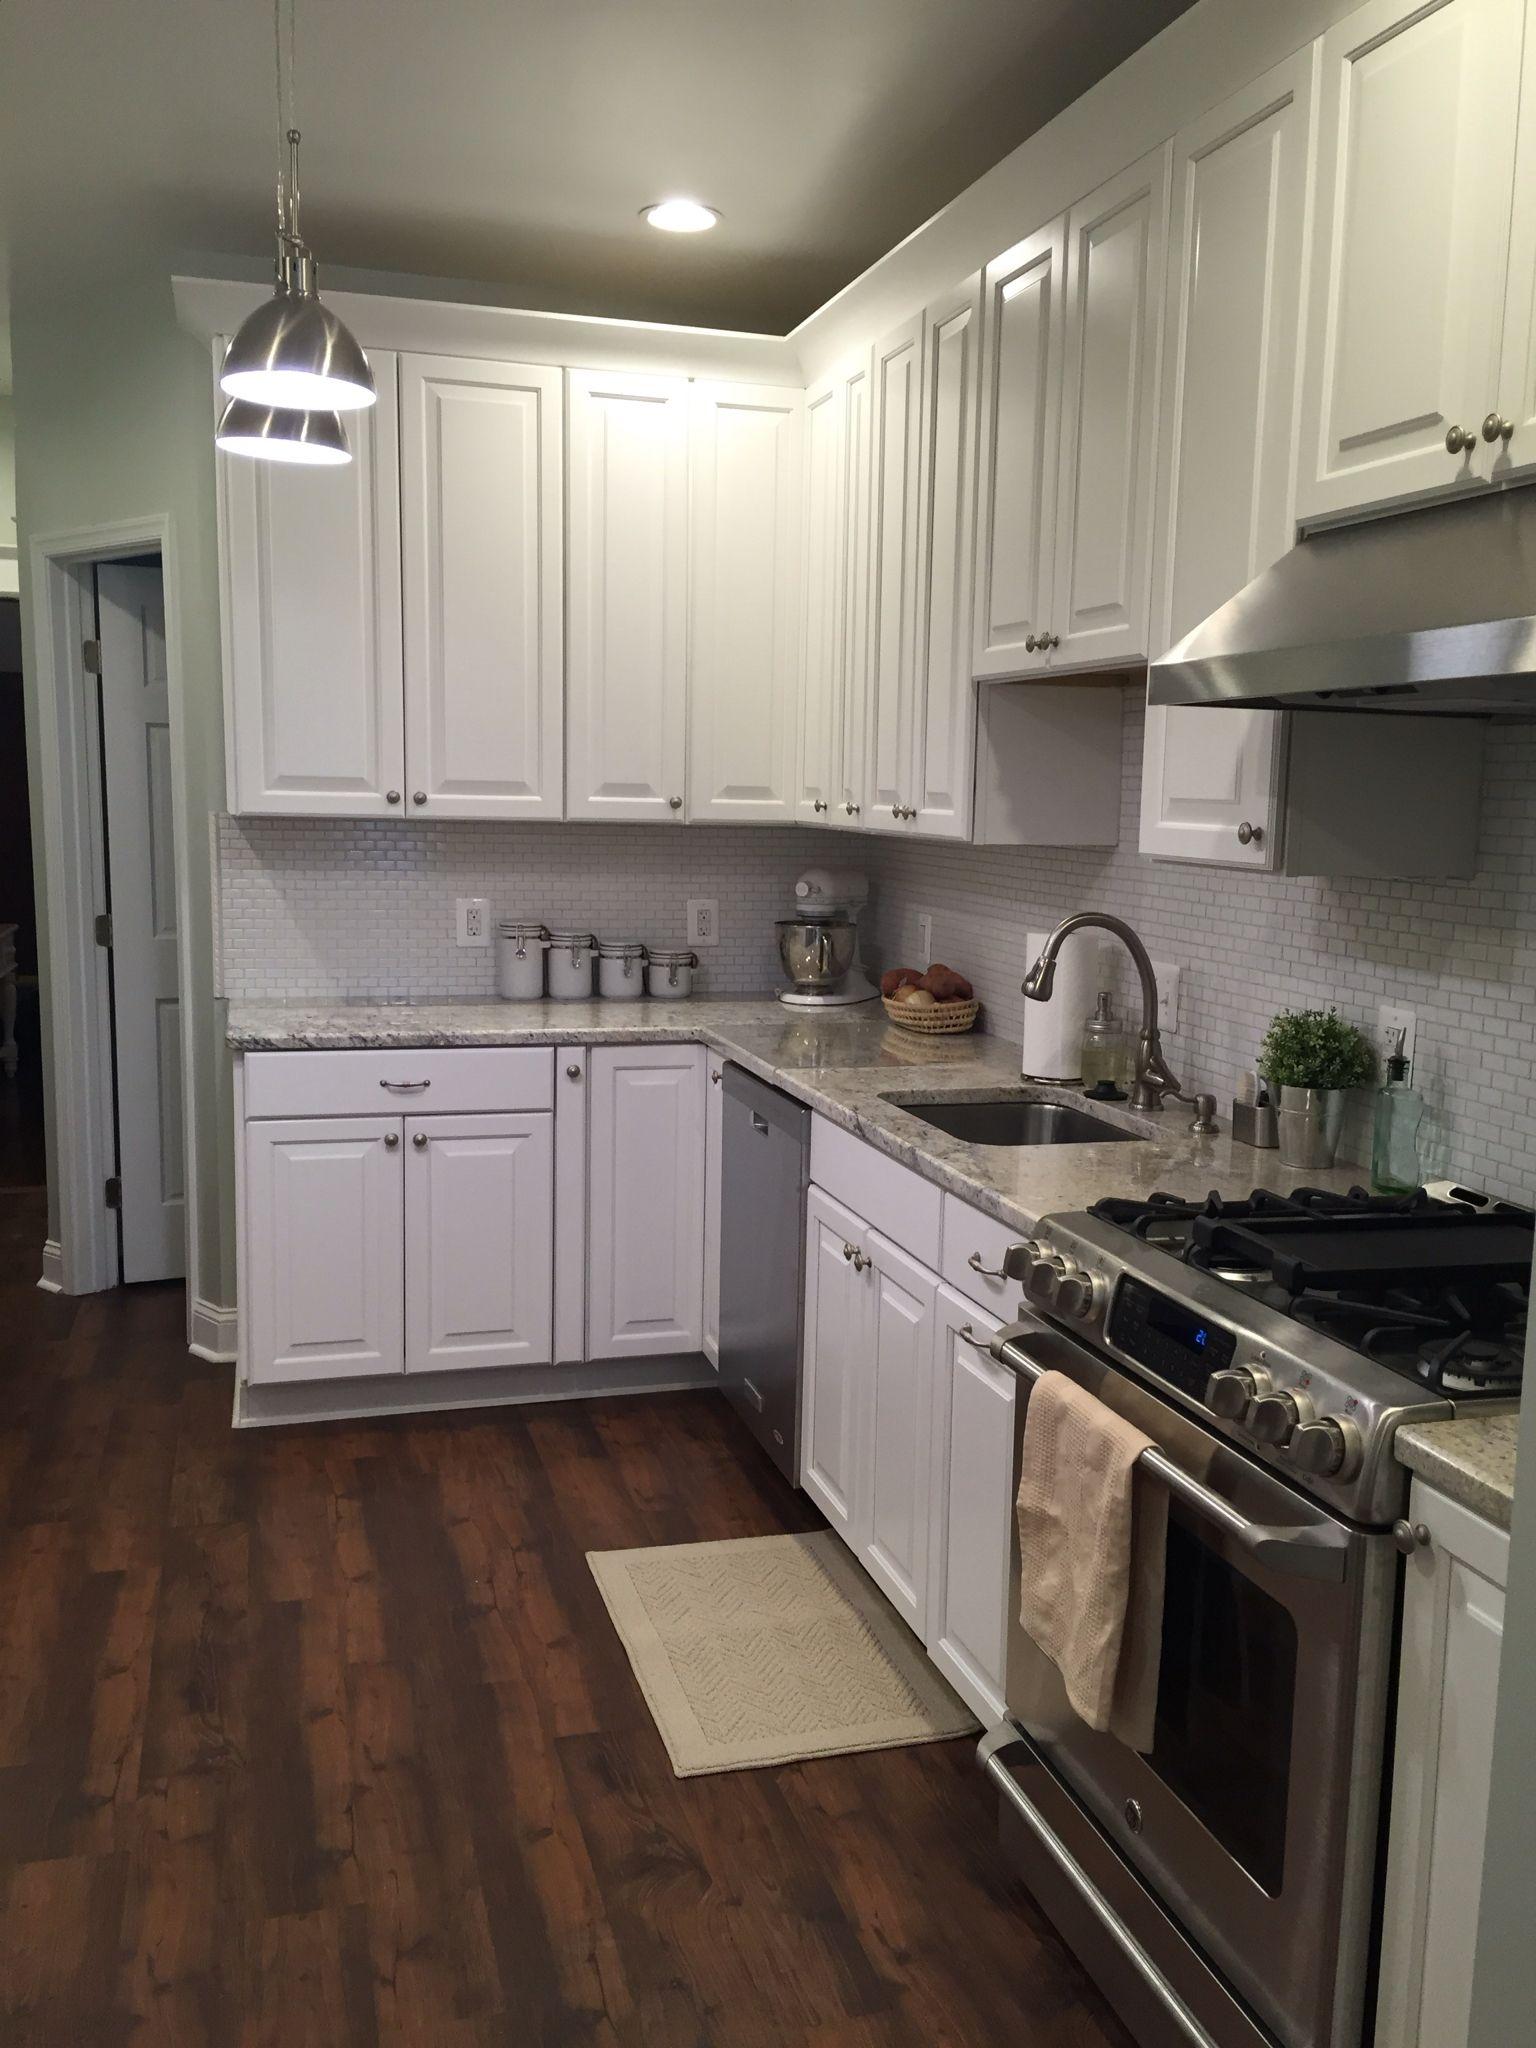 American Woodmark cabinets GE Cafe range resilient flooring in